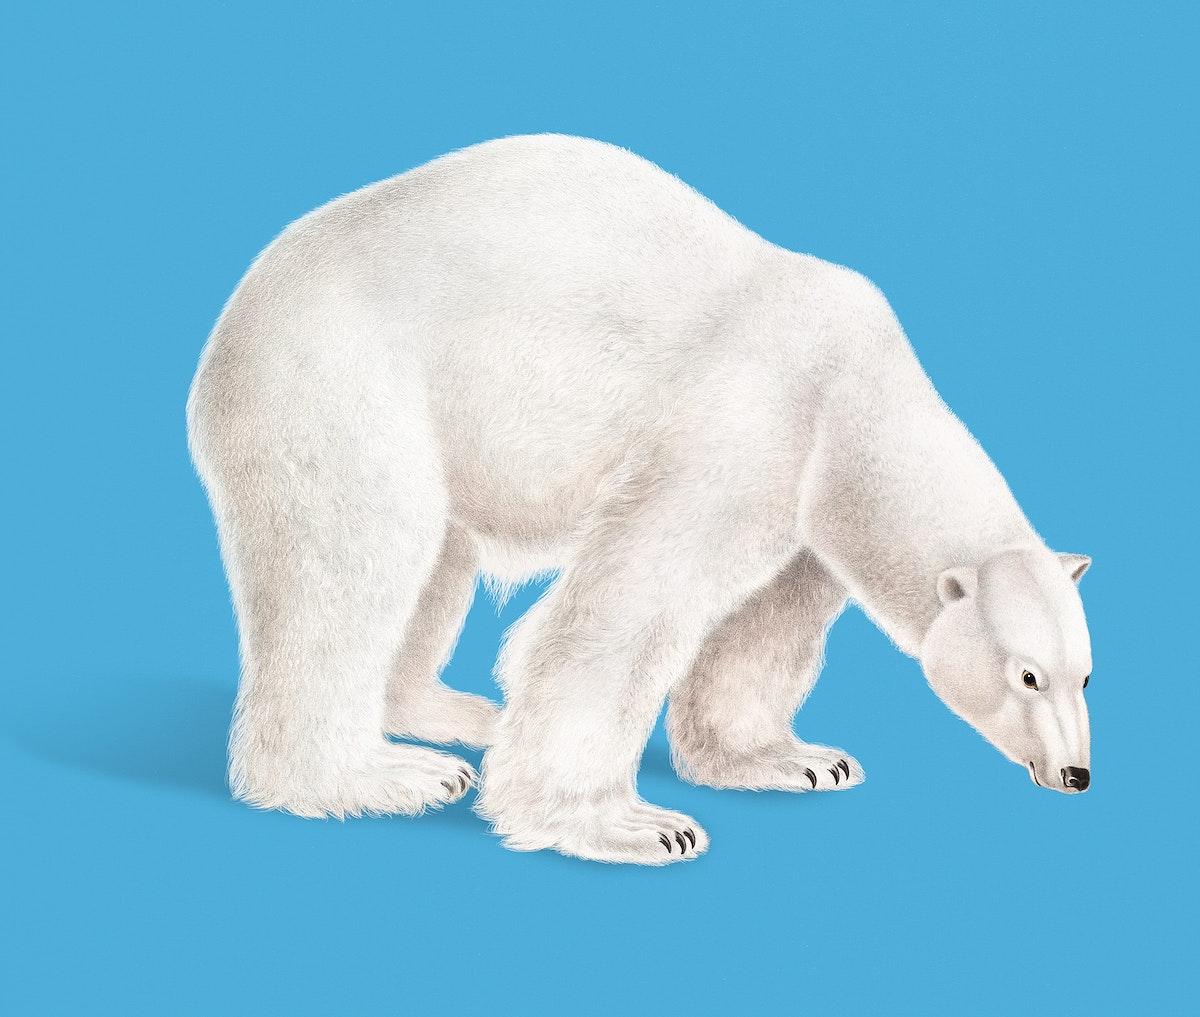 Vintage Illustration of Polar Bear.